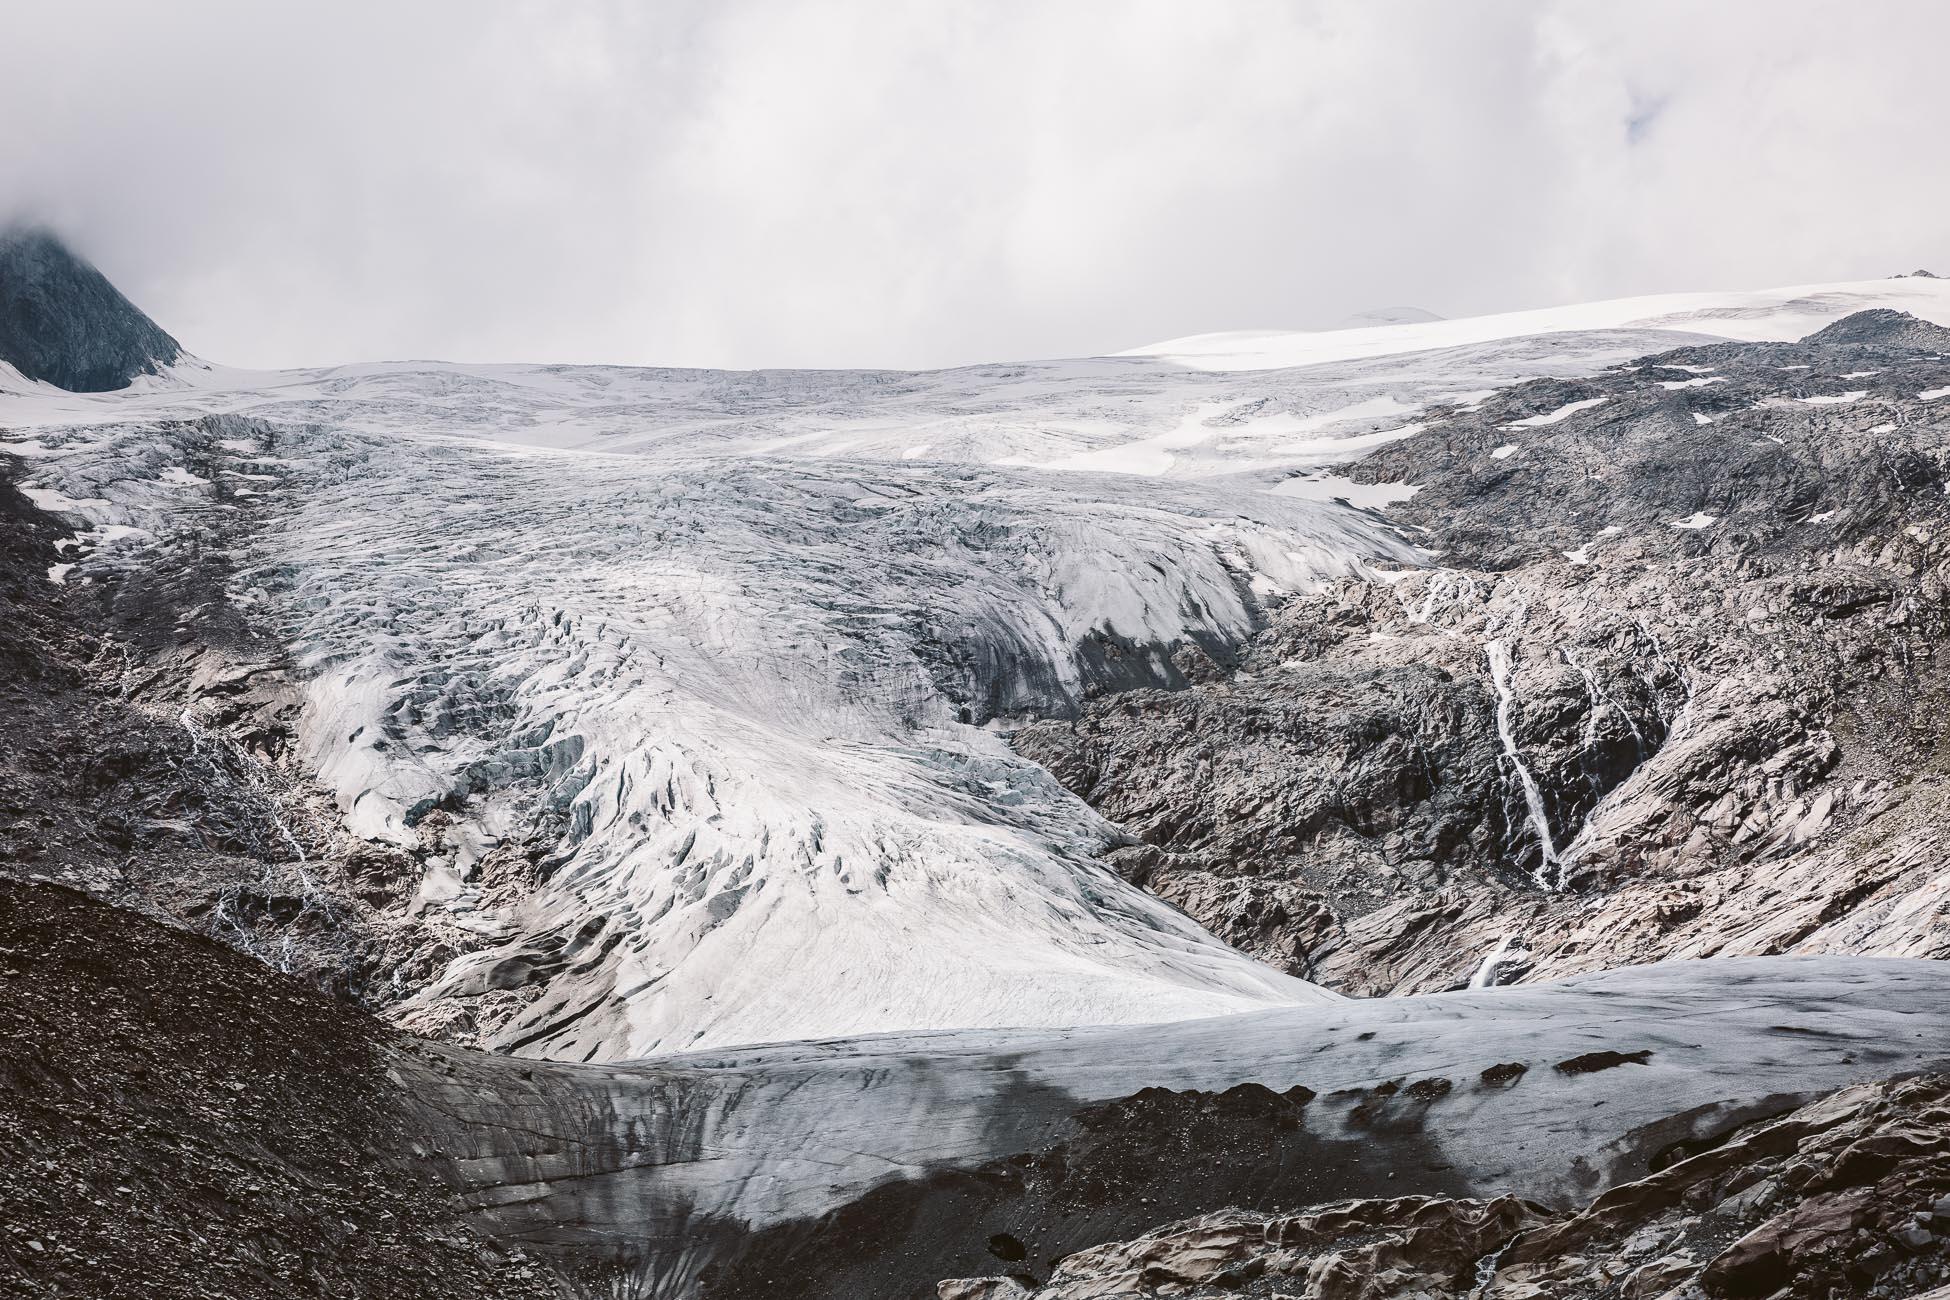 Schlatenkees Glacier at Innergschlöss National Park Hohe Tauern East Tyrol Austria